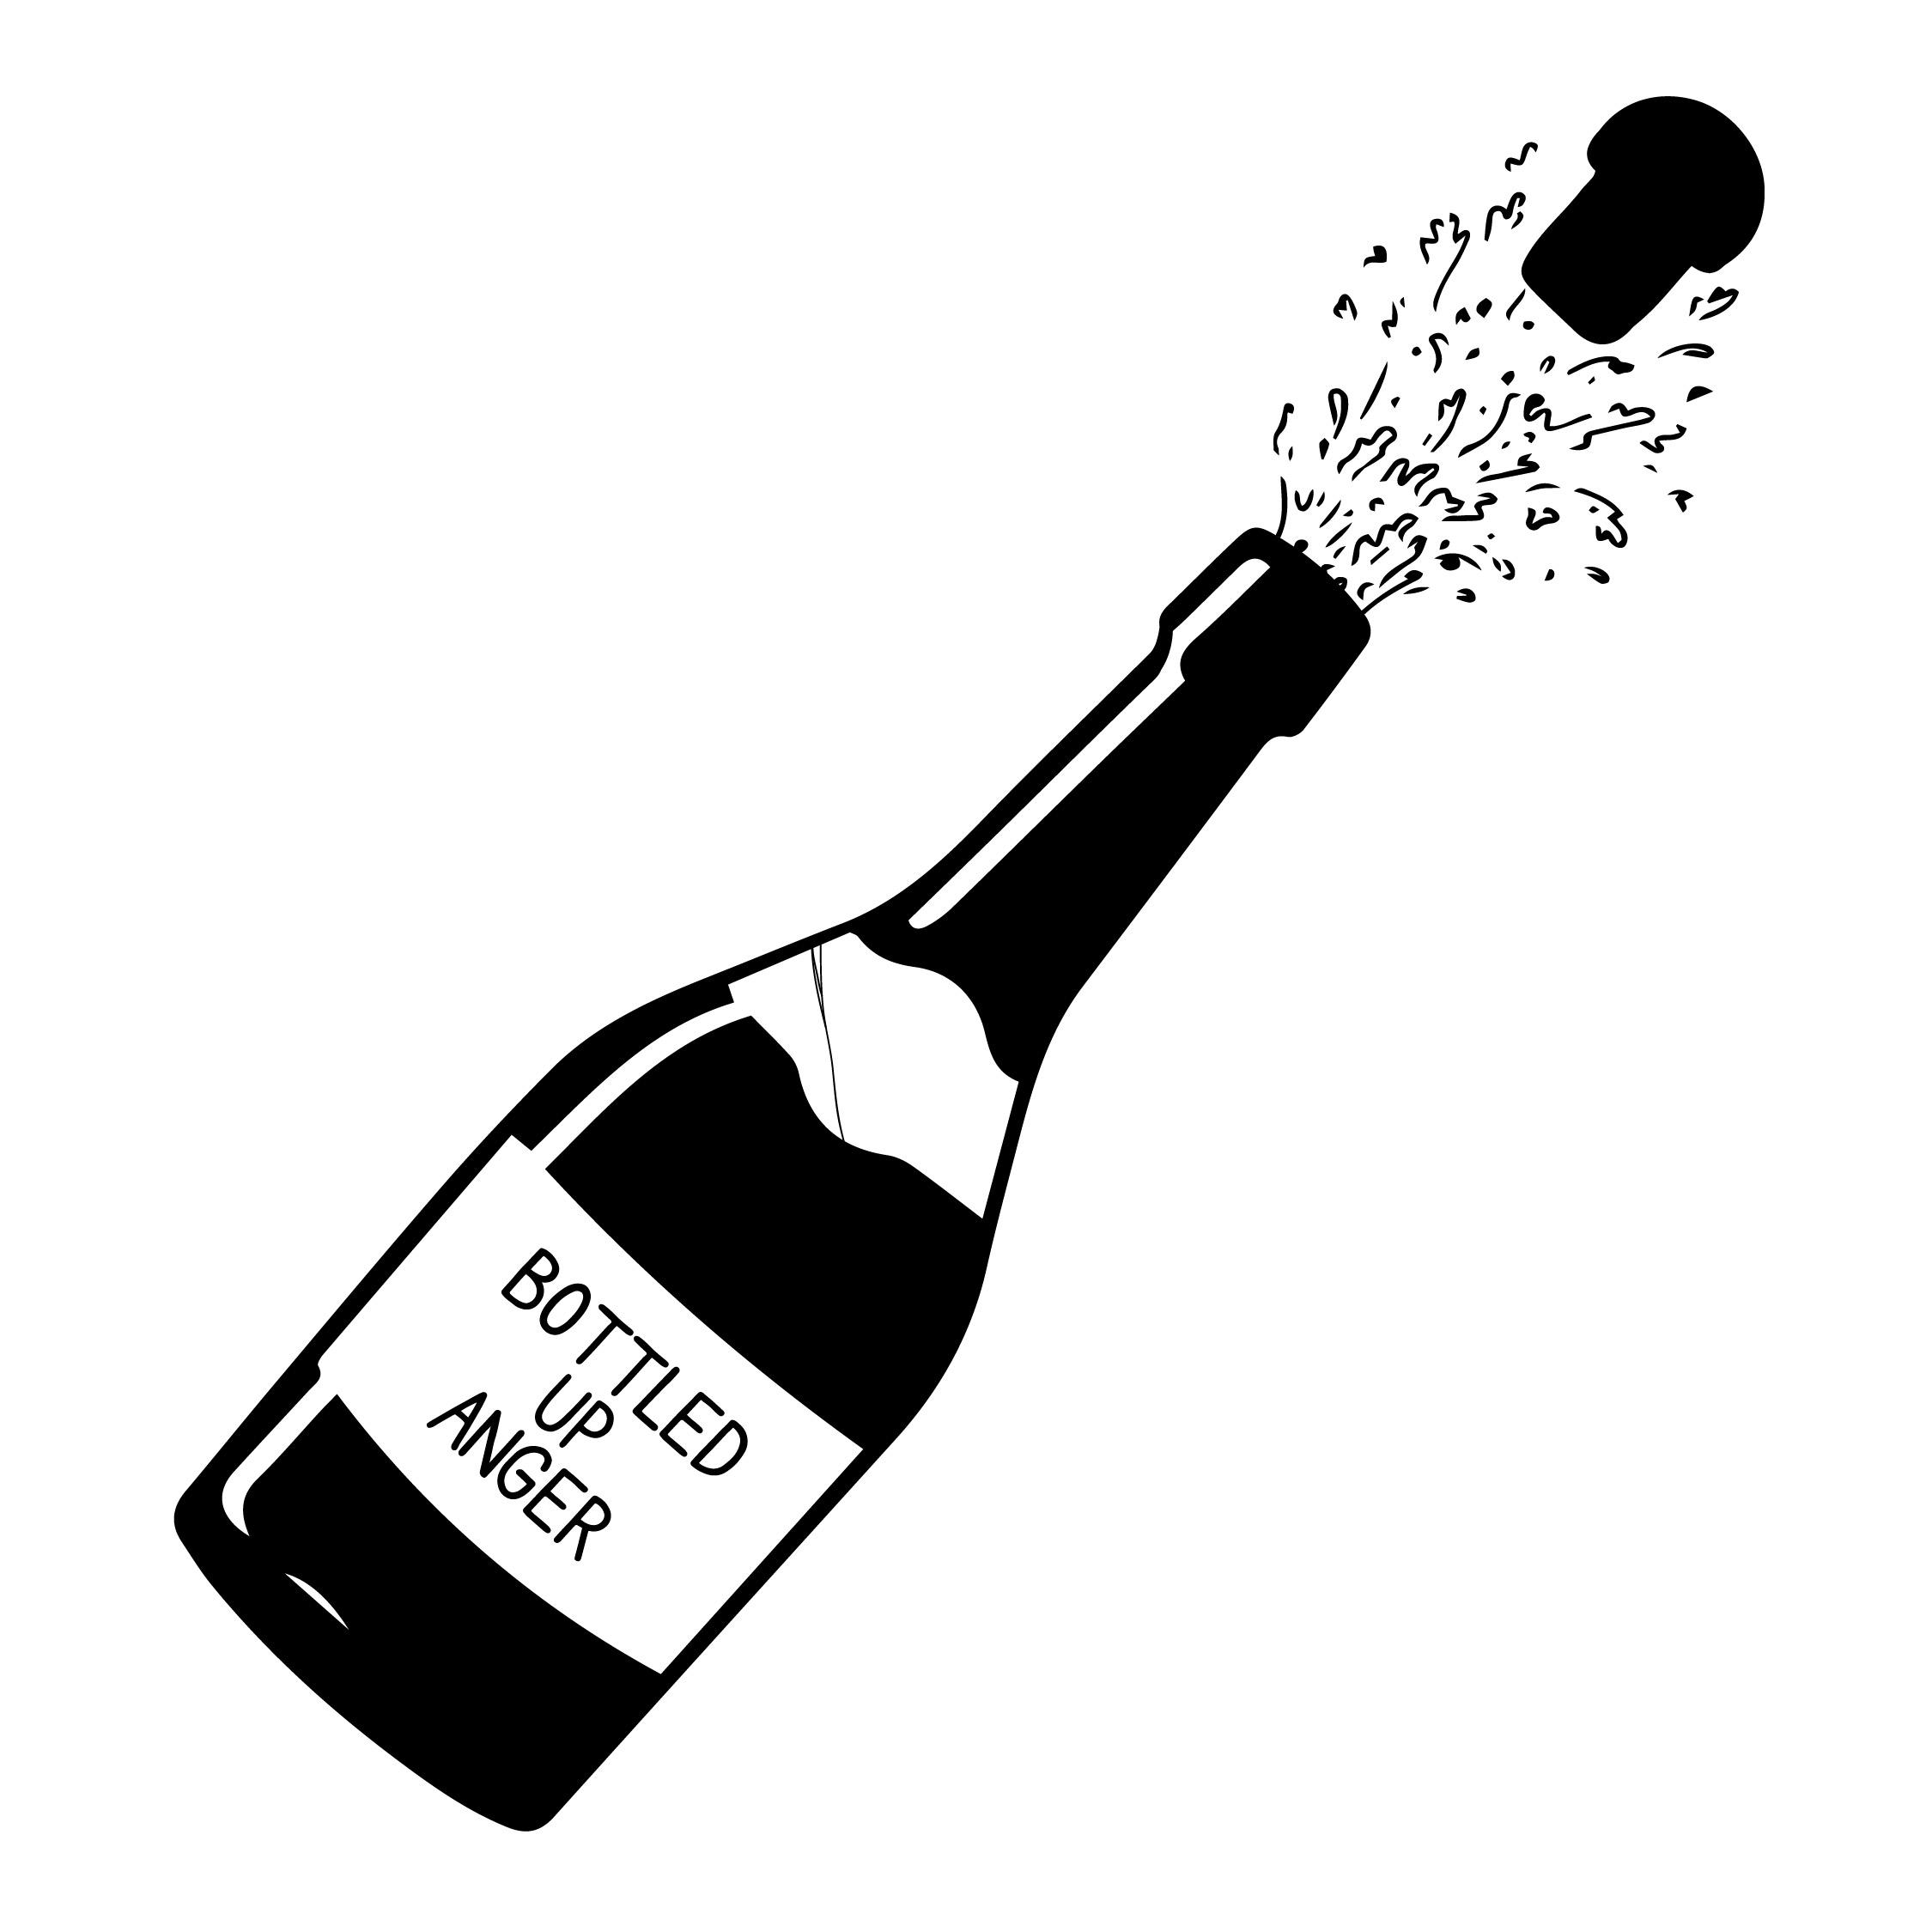 bottleupanger-01.jpg